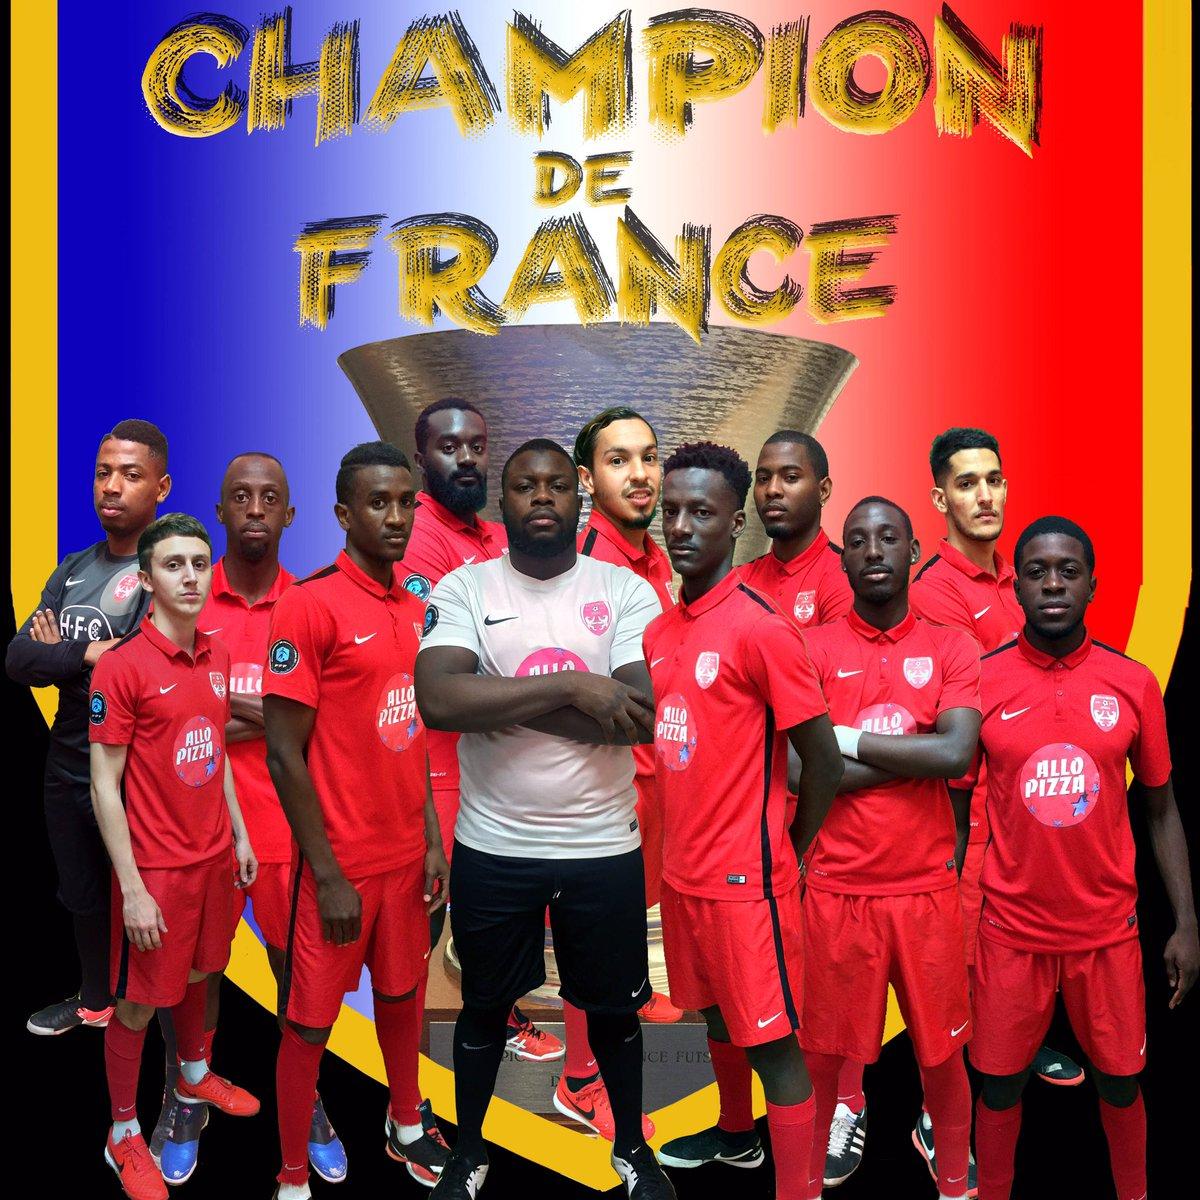 Here are the champions  #TeamDM87 #generation87 #teamdjibson #futsal #championdefrance <br>http://pic.twitter.com/XLS9KABhl4